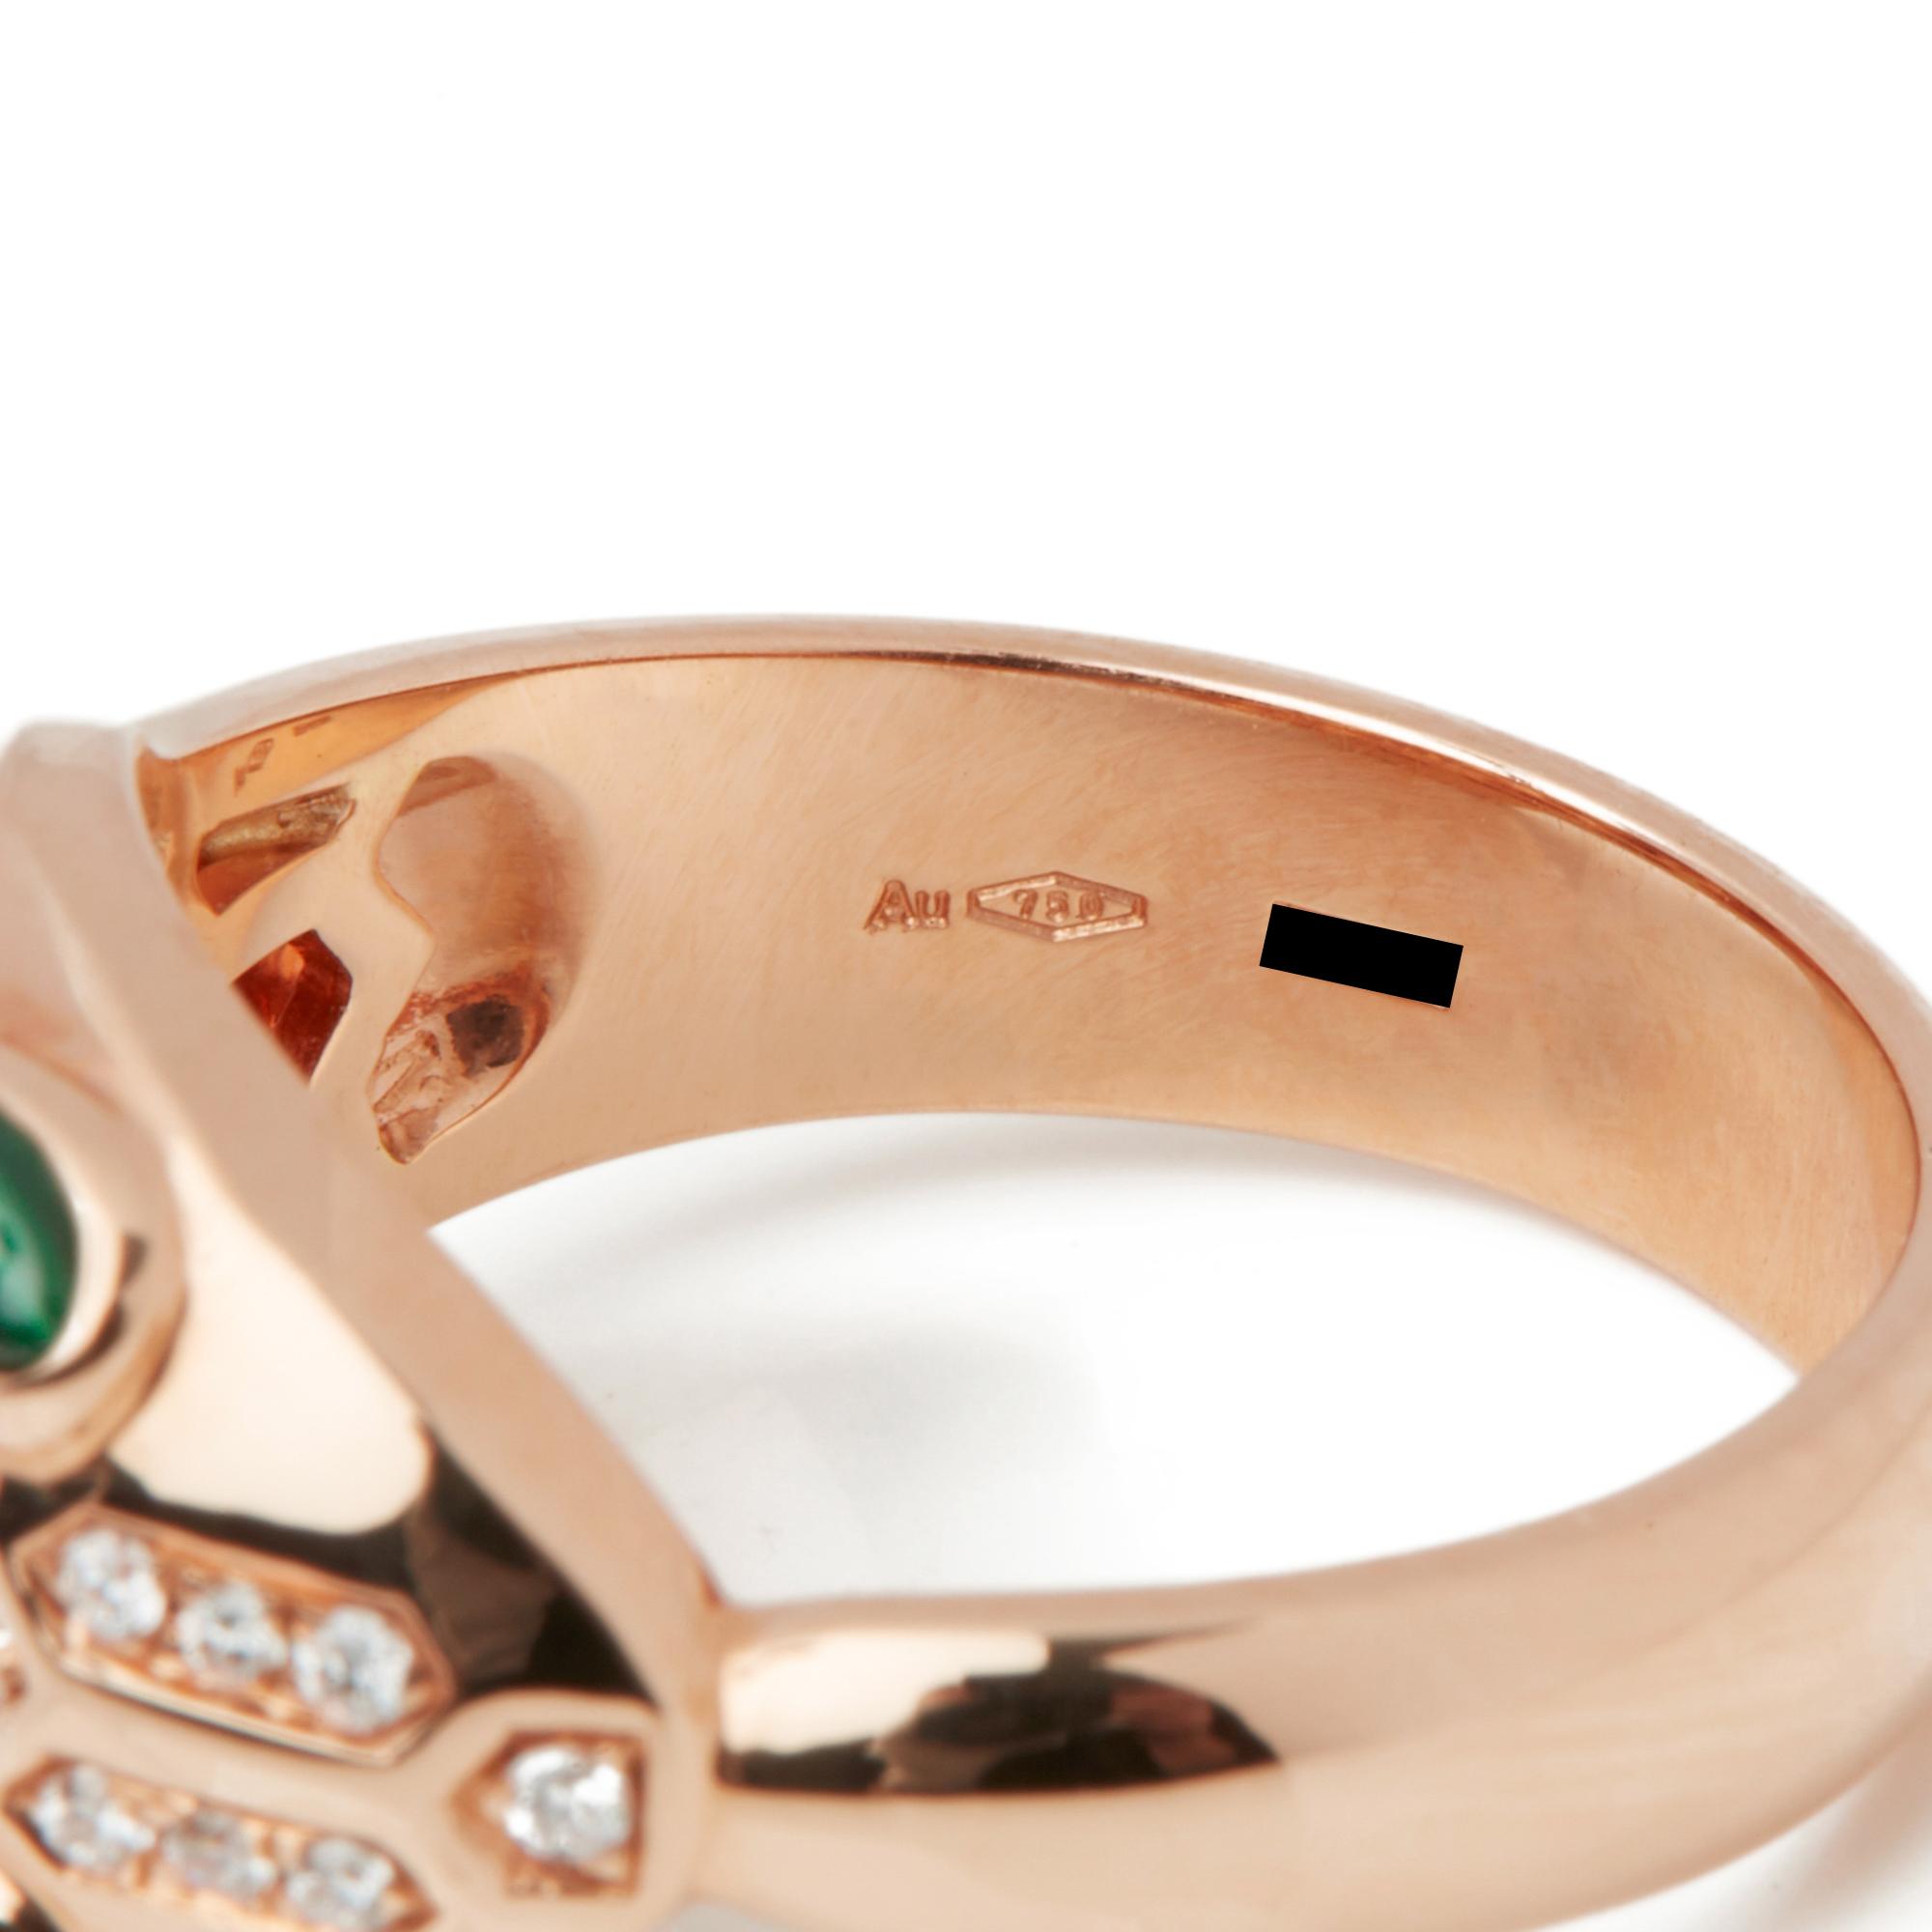 18k Rose Gold Diamond & Malachite Serpenti Ring - Image 6 of 10